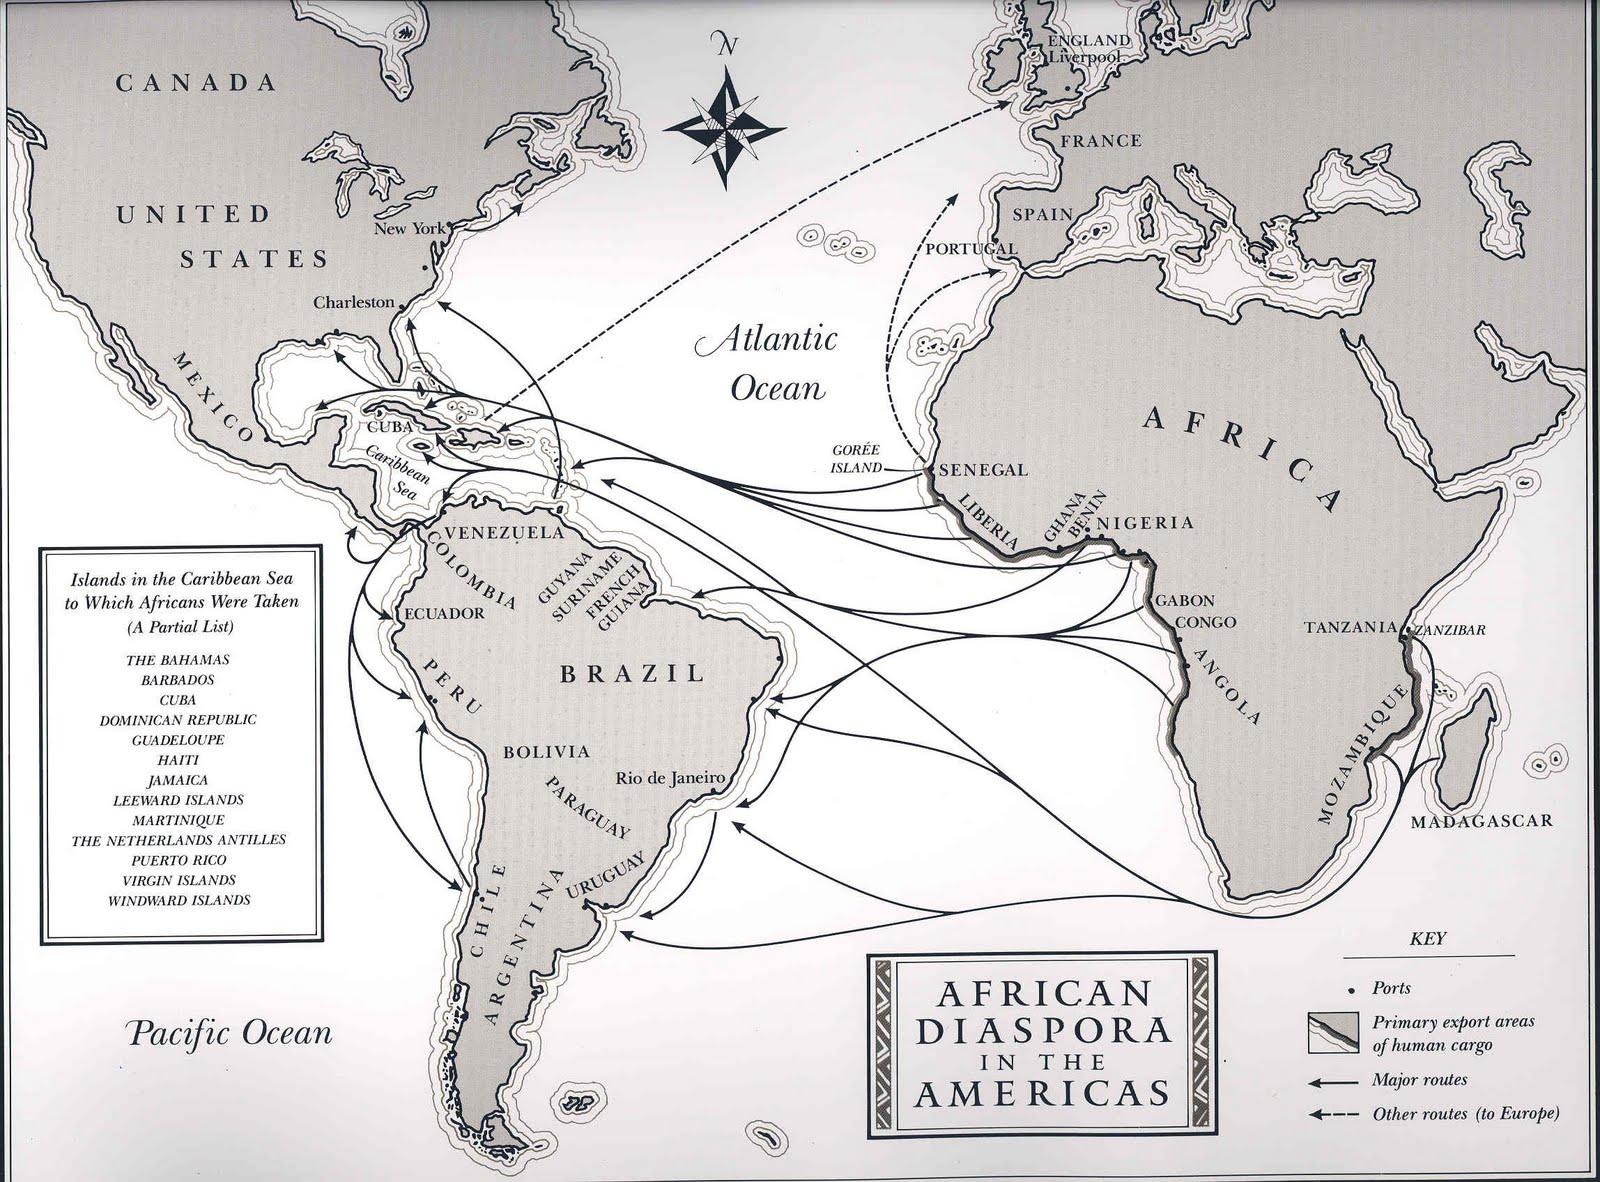 africandiasporaamericas